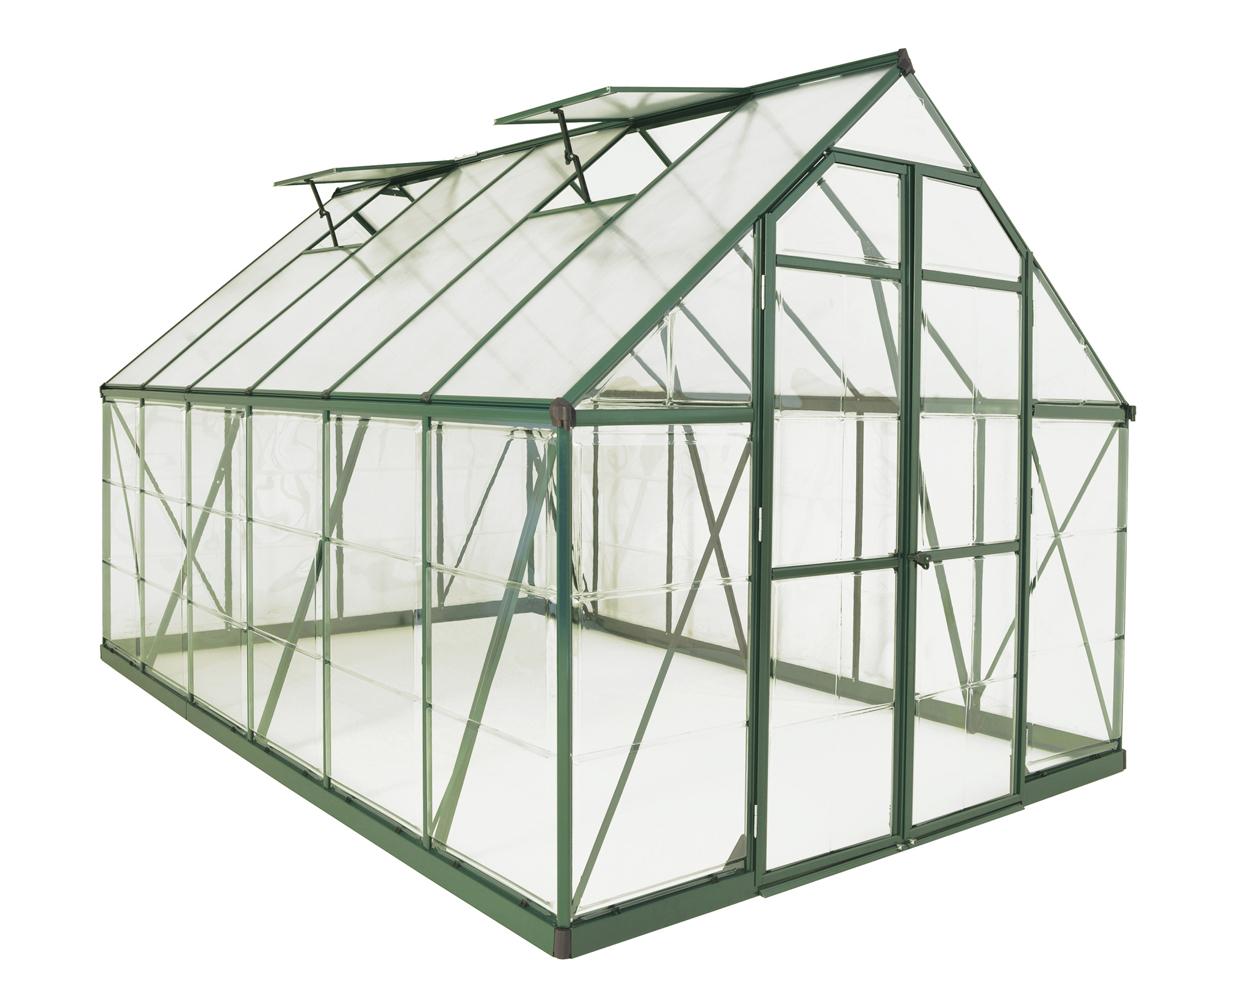 Balance 8' x 12' Greenhouse